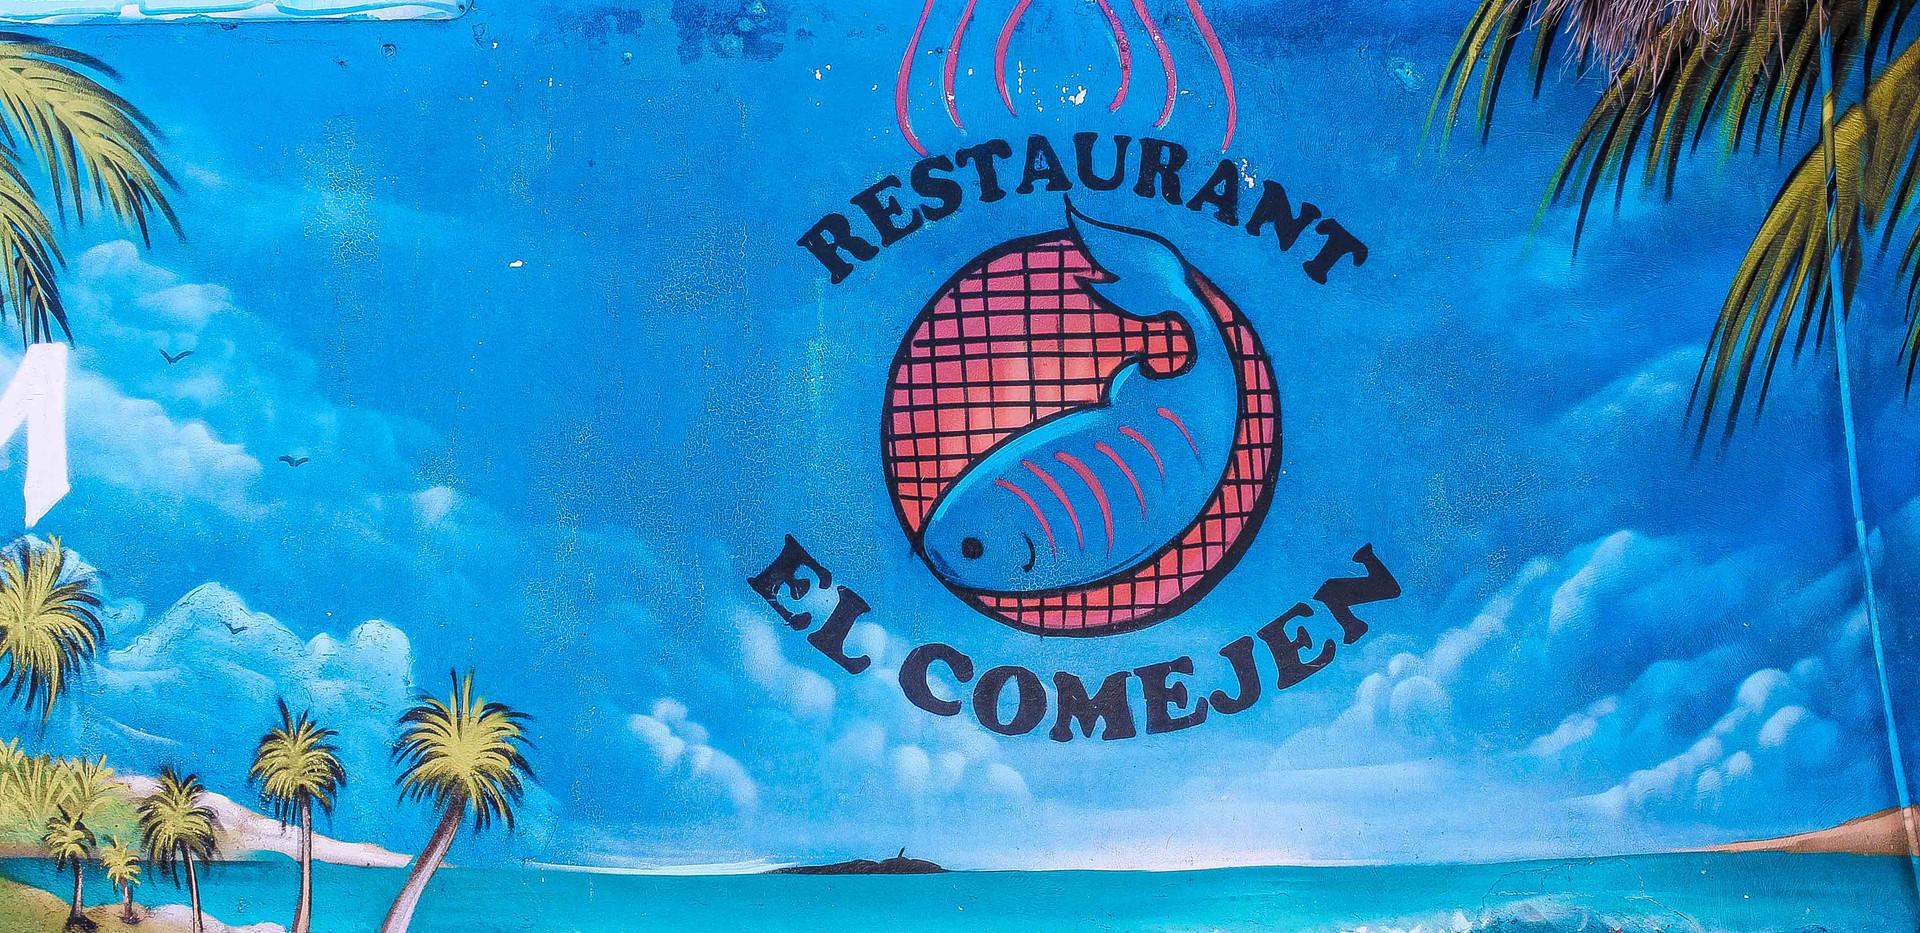 ElComejen-tasteofisla-islamujeres-food-t